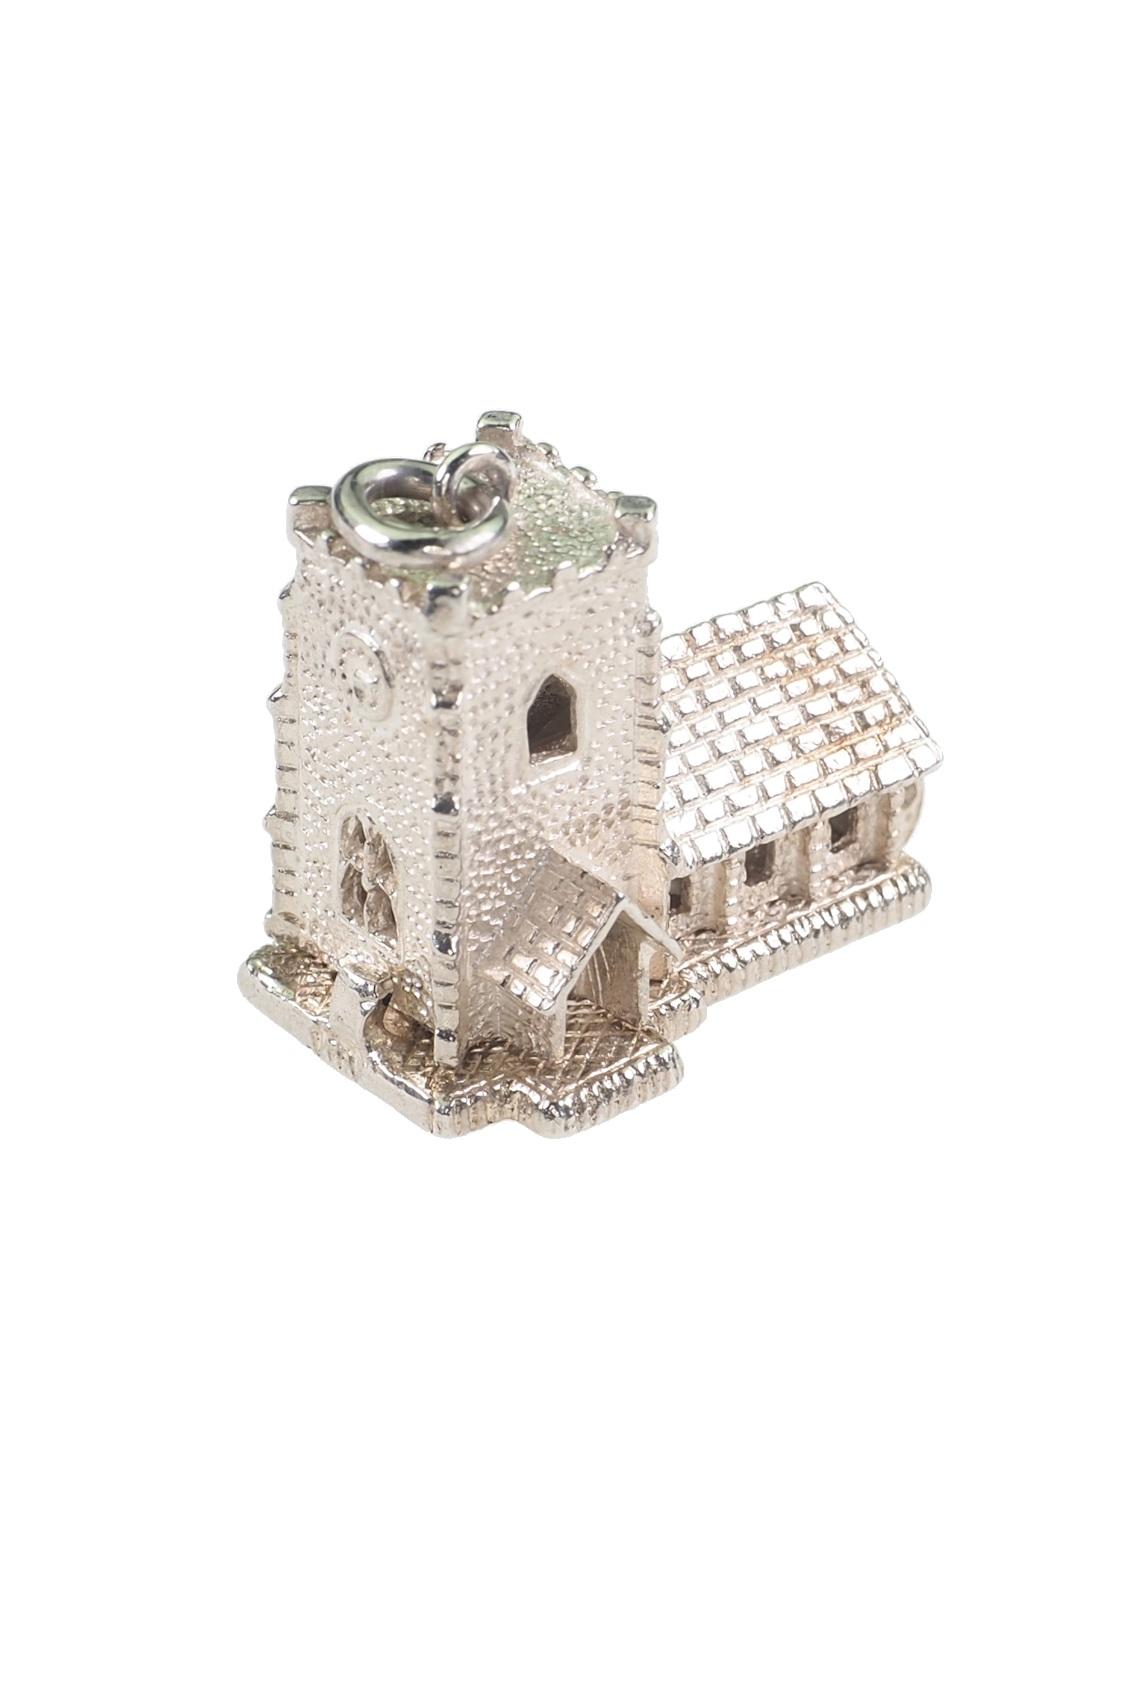 antiken-Silberschmuck-kaufen-2307